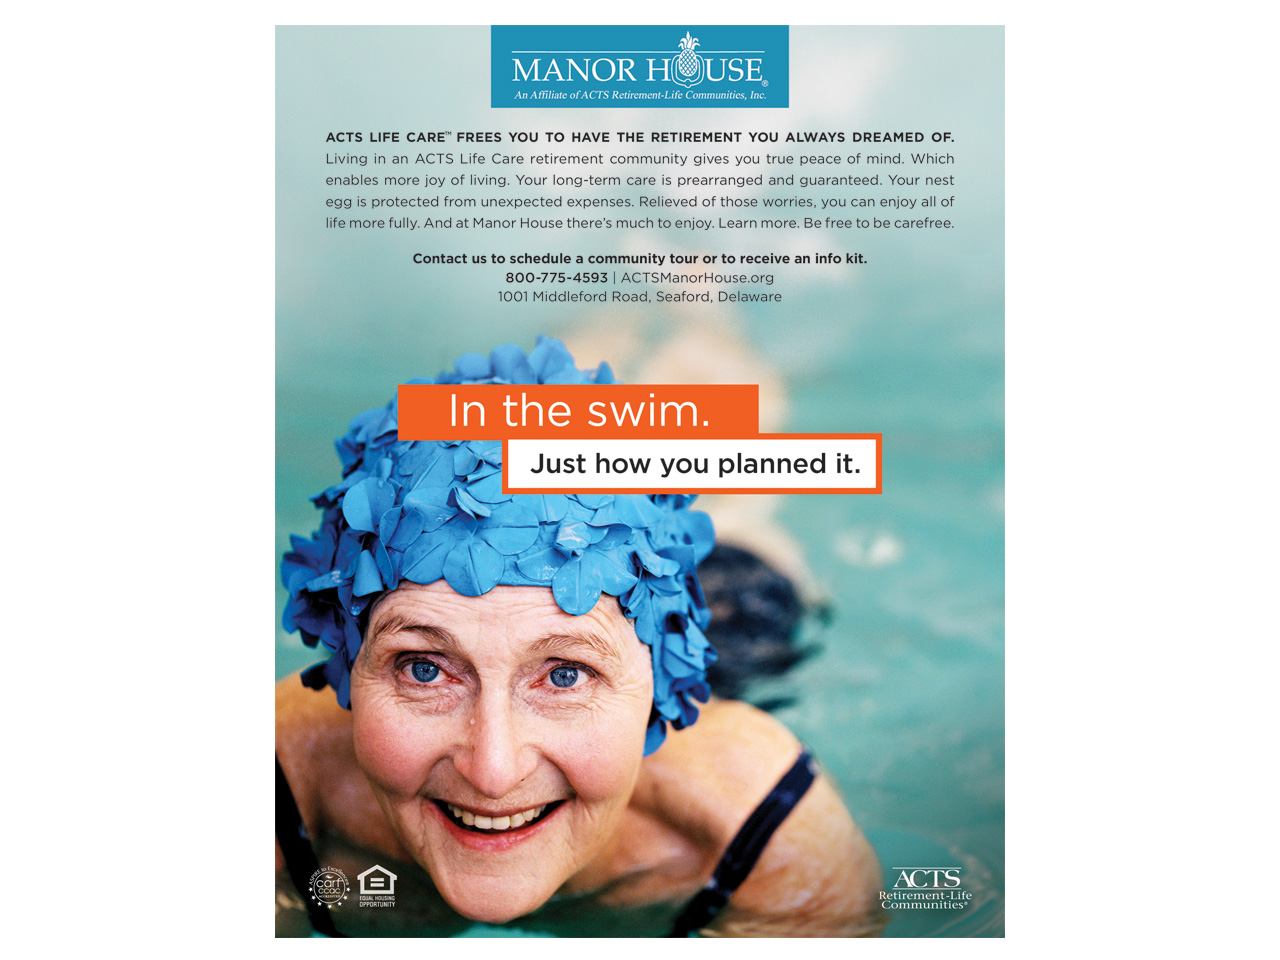 Print Ad - In the swim